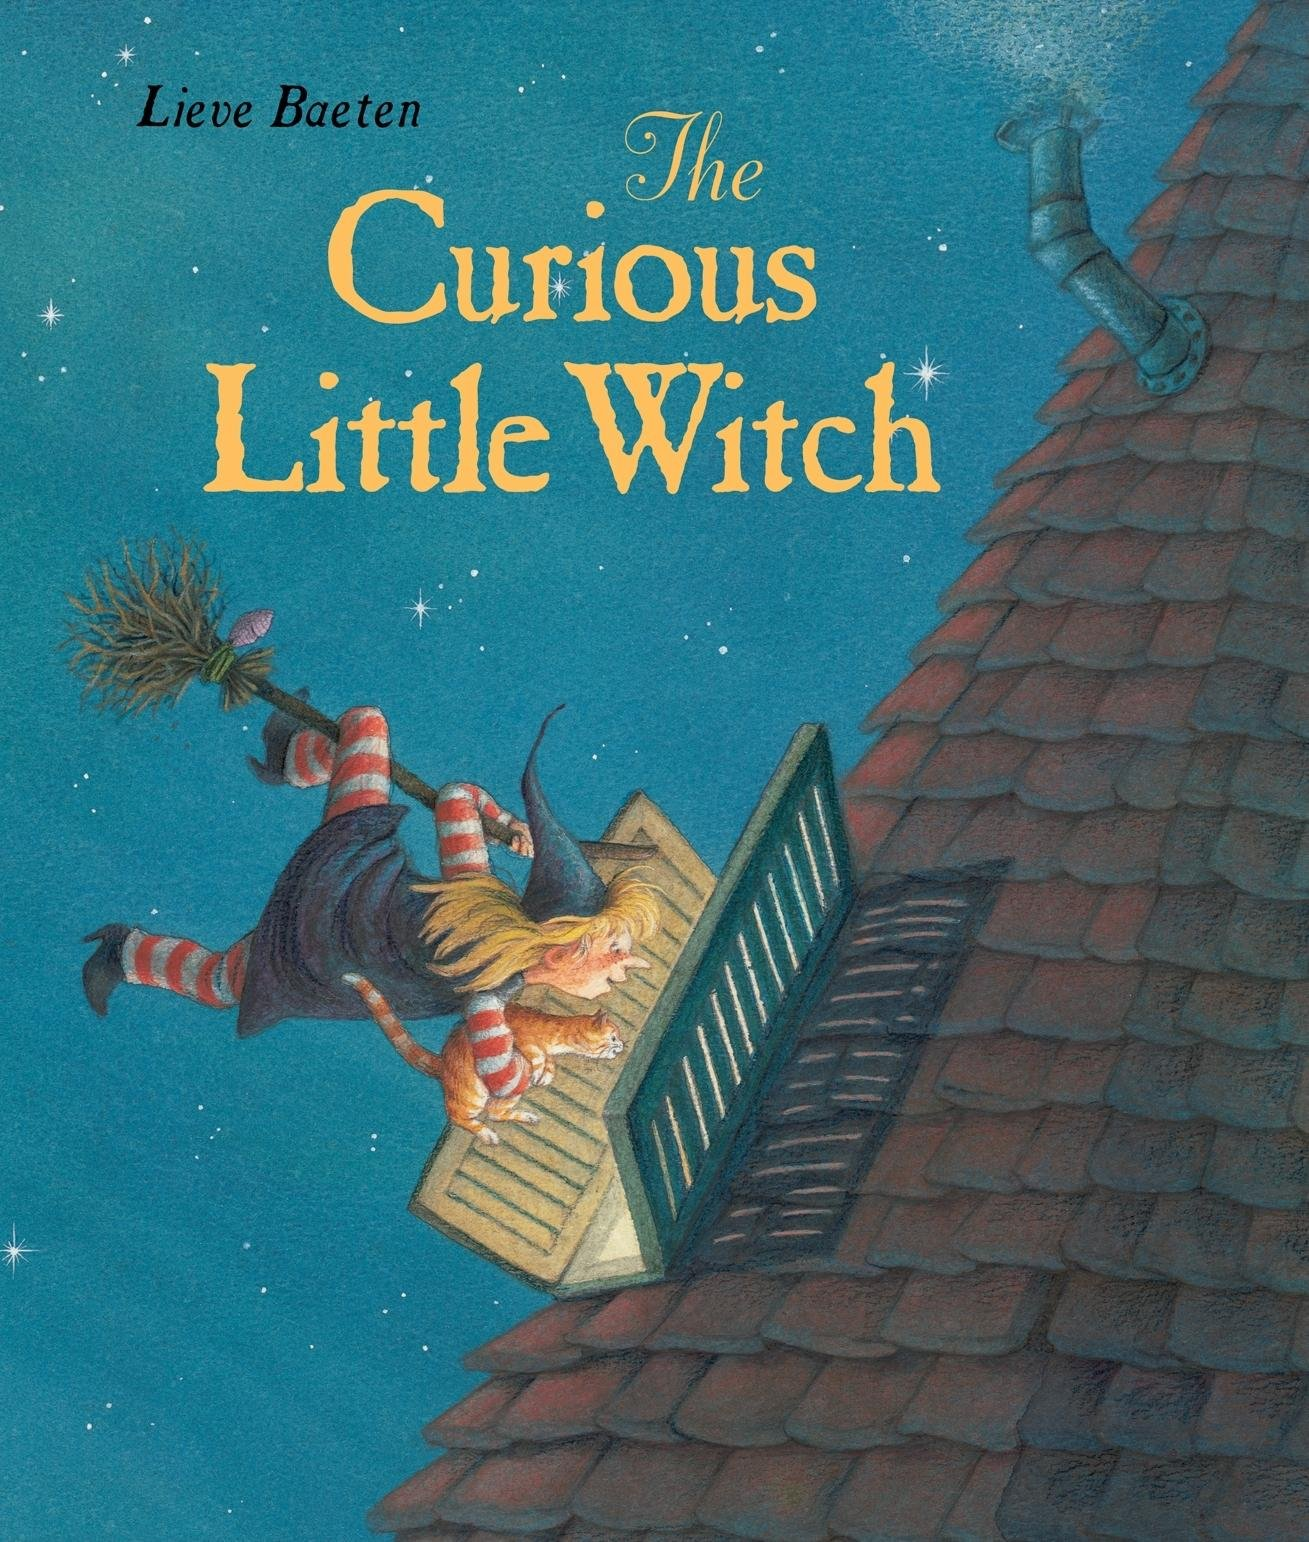 The Curious Little Witch: Lieve Baeten: 9780735823051: Amazon.com: Books